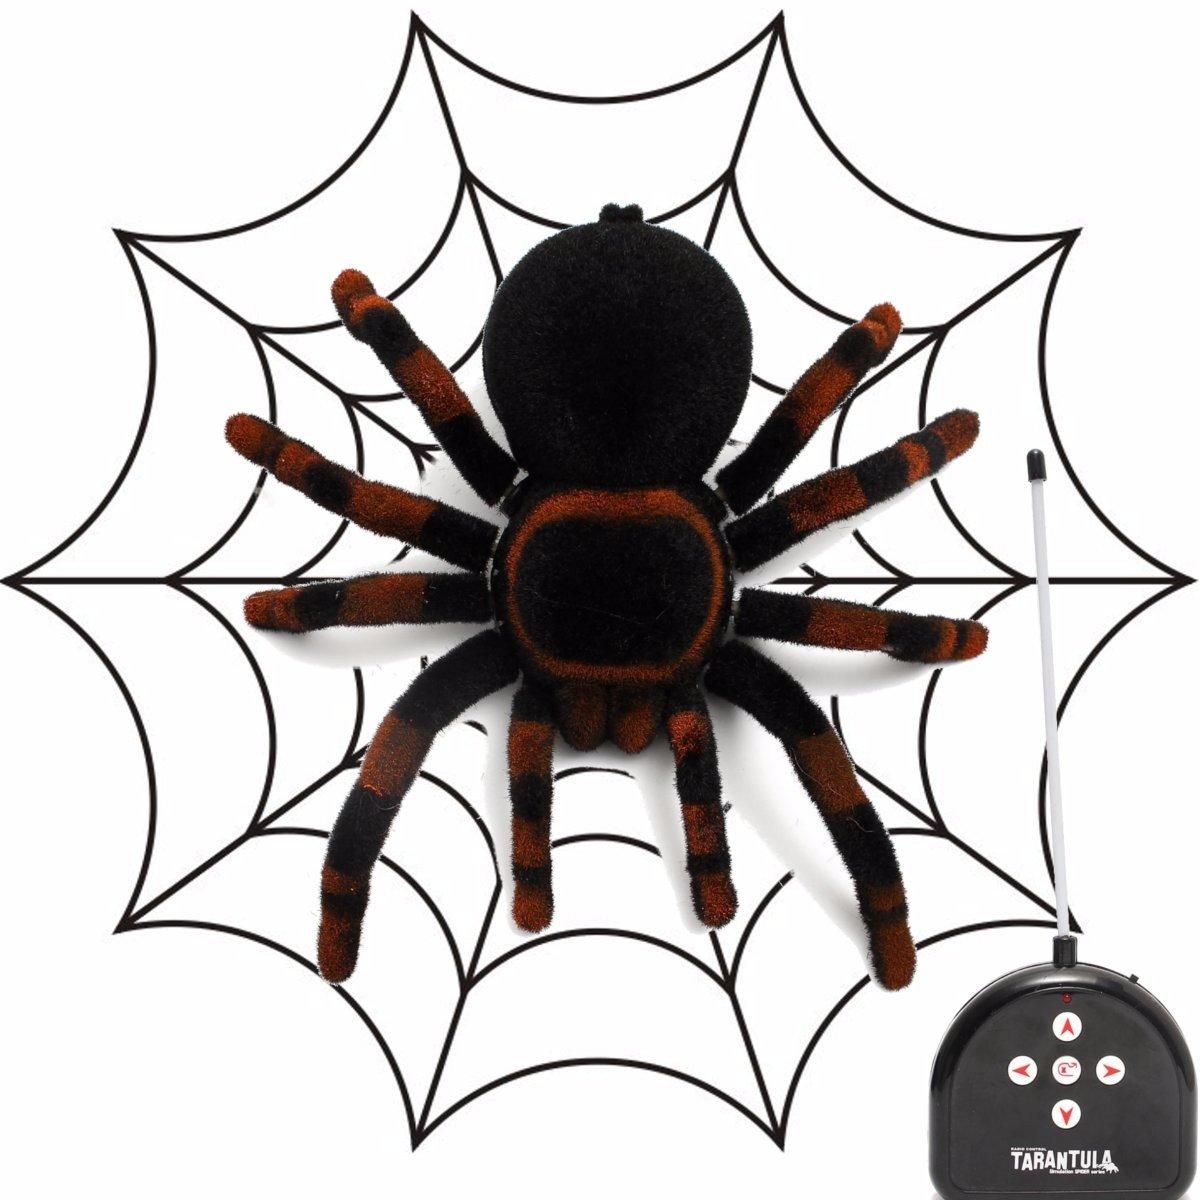 amazon com meco spider scary toy remote control 8 u0027 u0027 4ch realistic